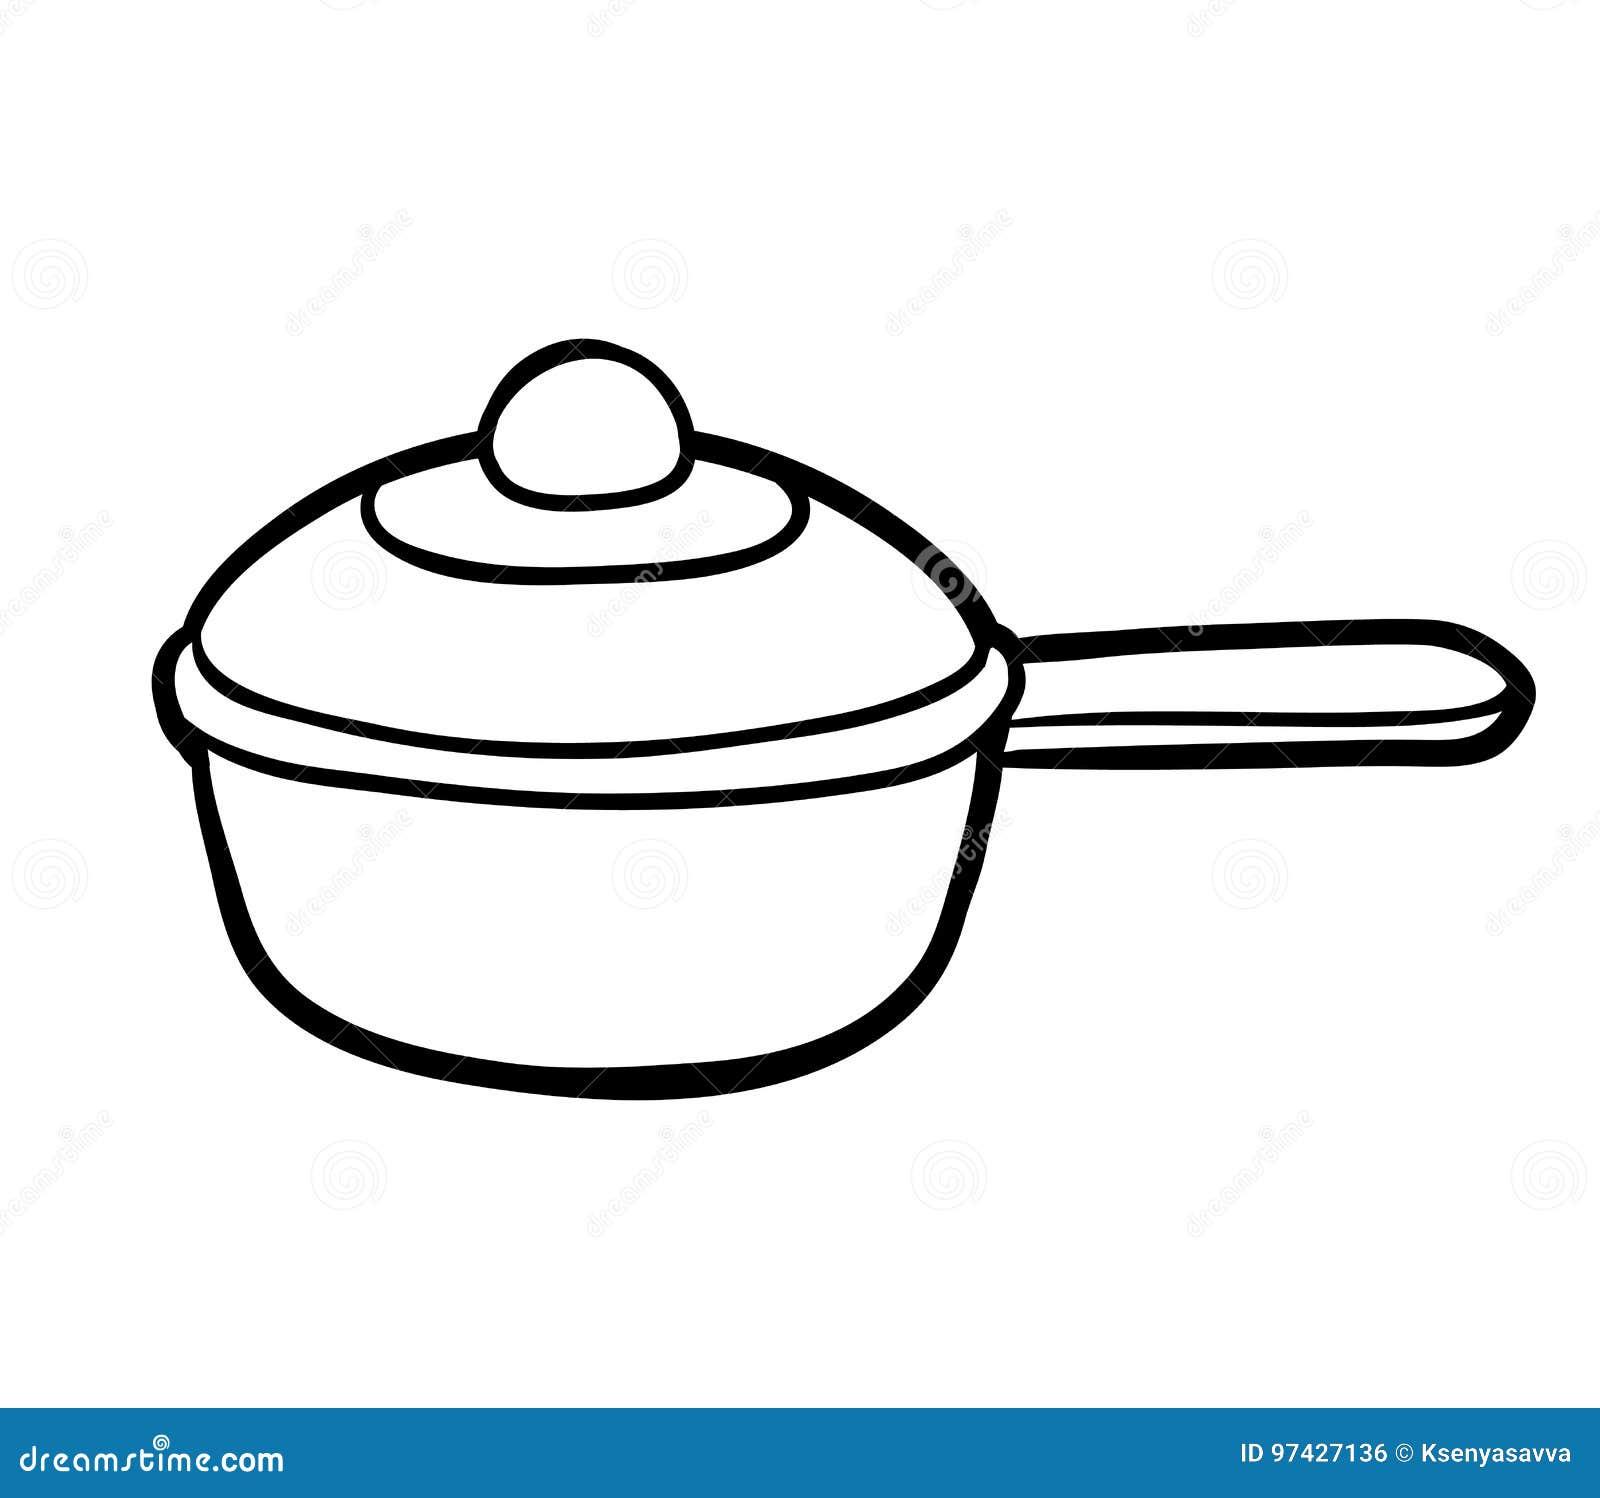 Livre de coloriage casserole illustration de vecteur - Casserole dessin ...